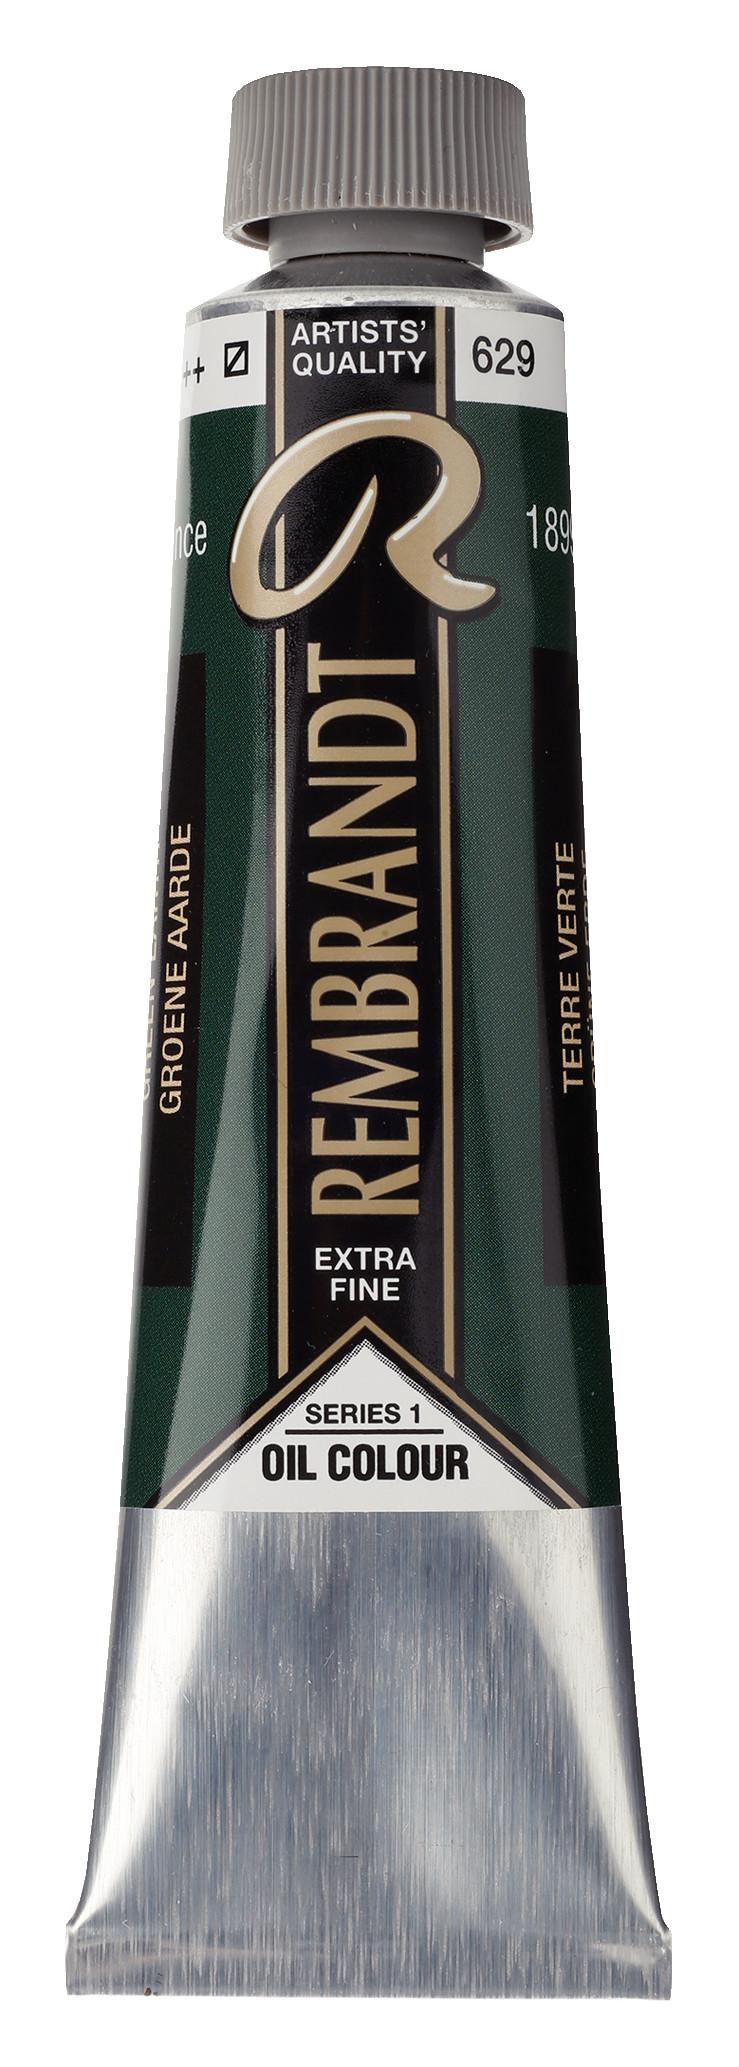 Rembrandt Oil colour Paint Green Earth (Terre Verte) (629) 40ml Tube